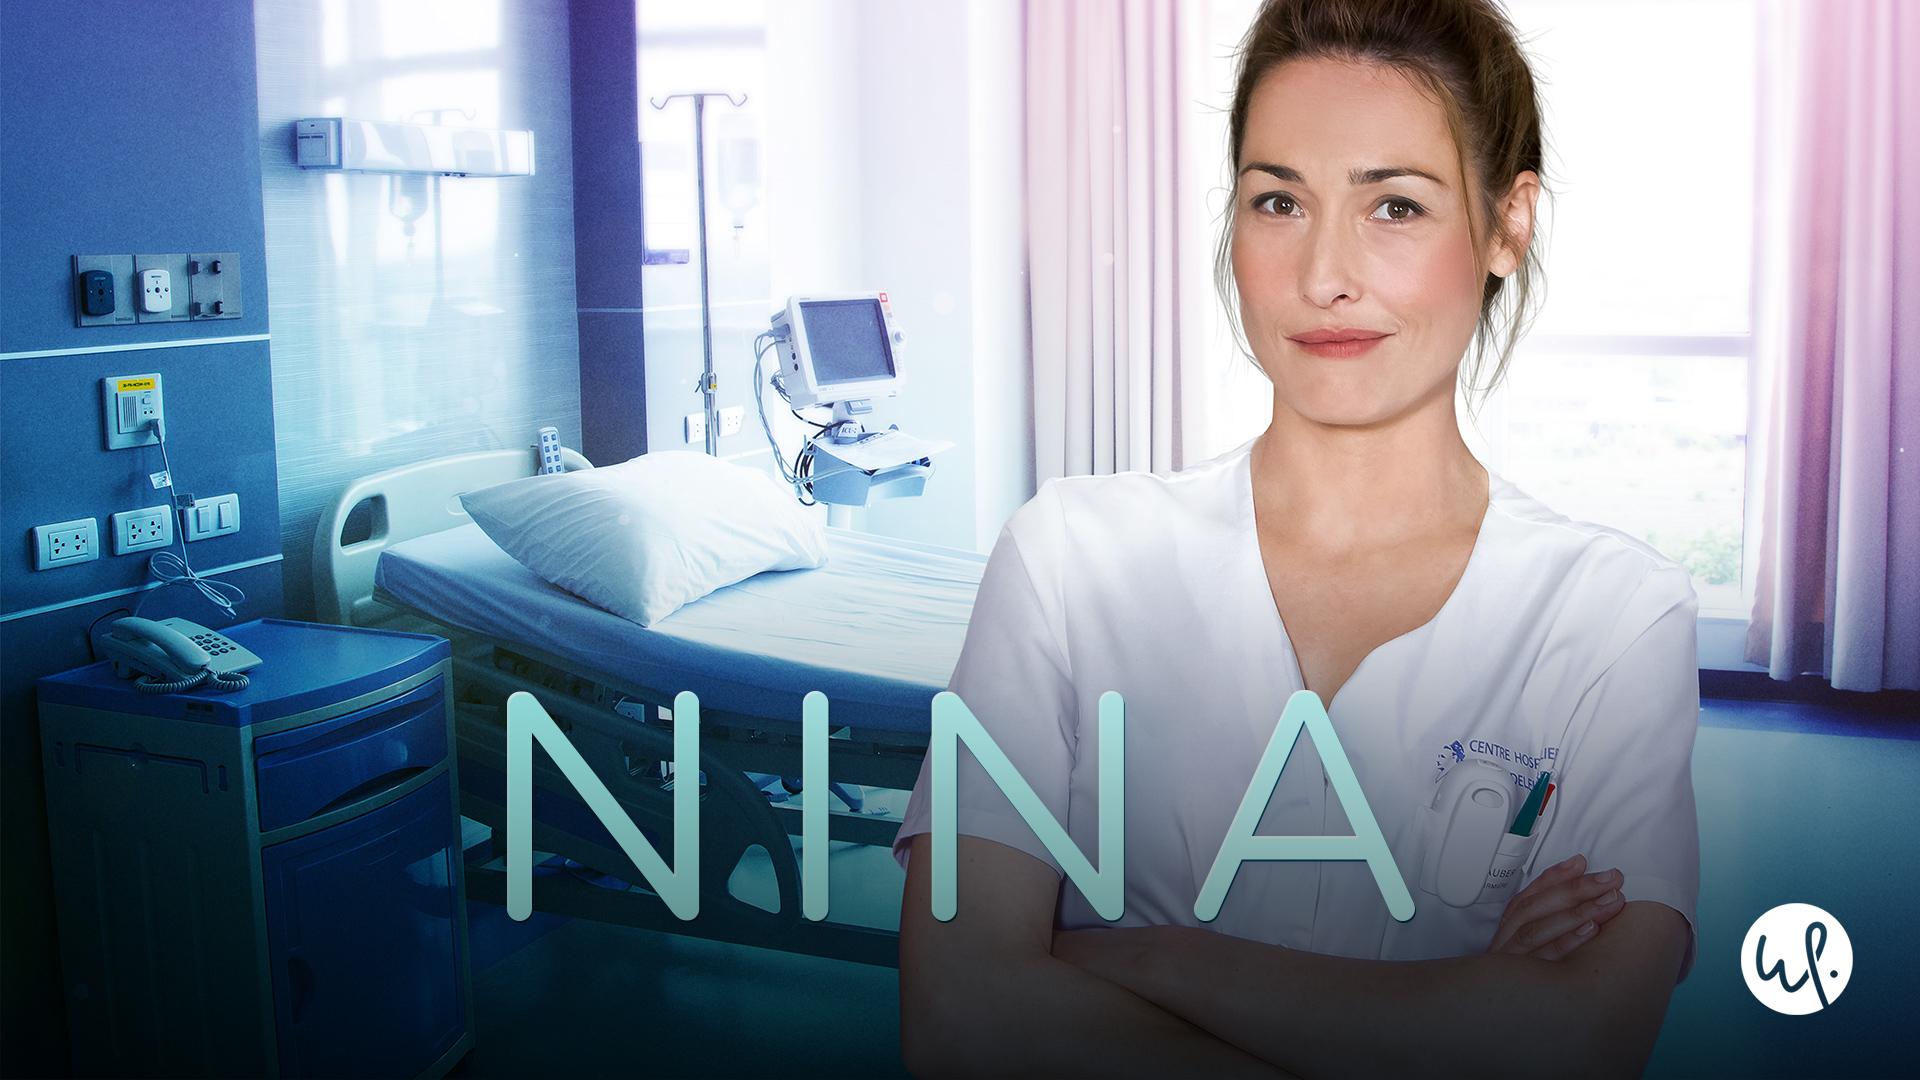 Nina, Season 1